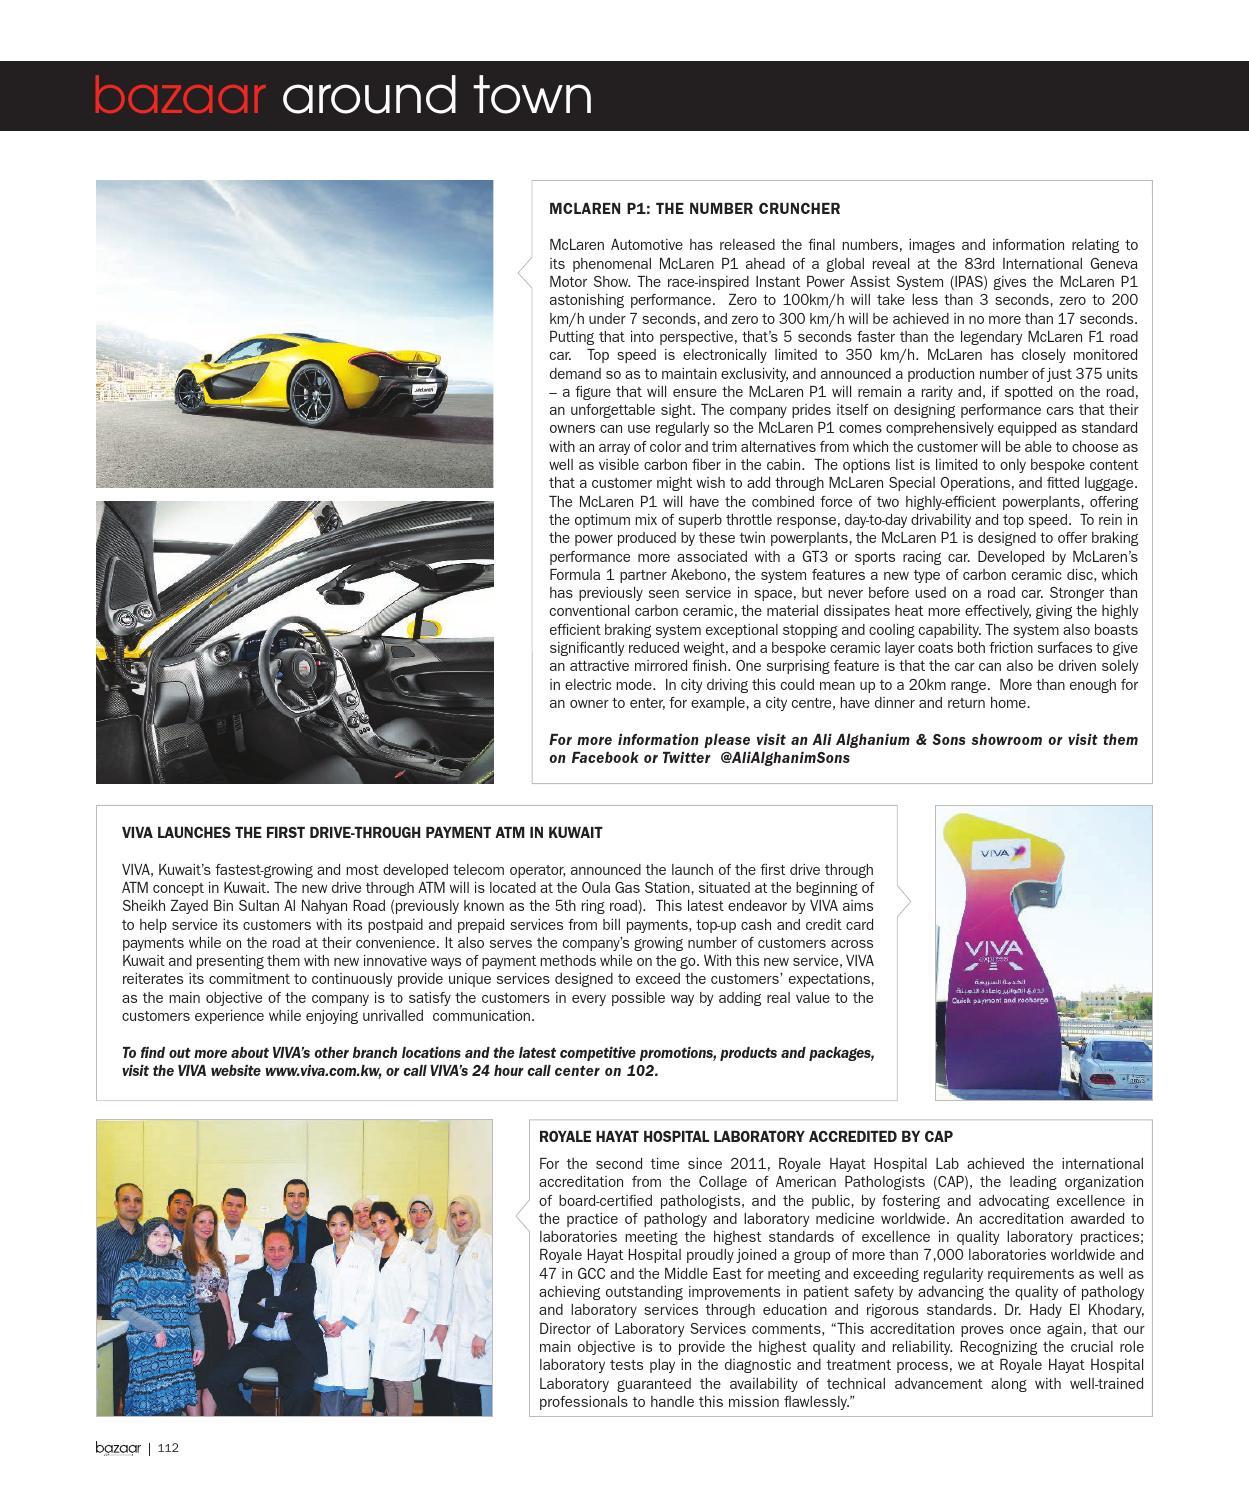 bazaar September 2013 by bazaar magazine - issuu